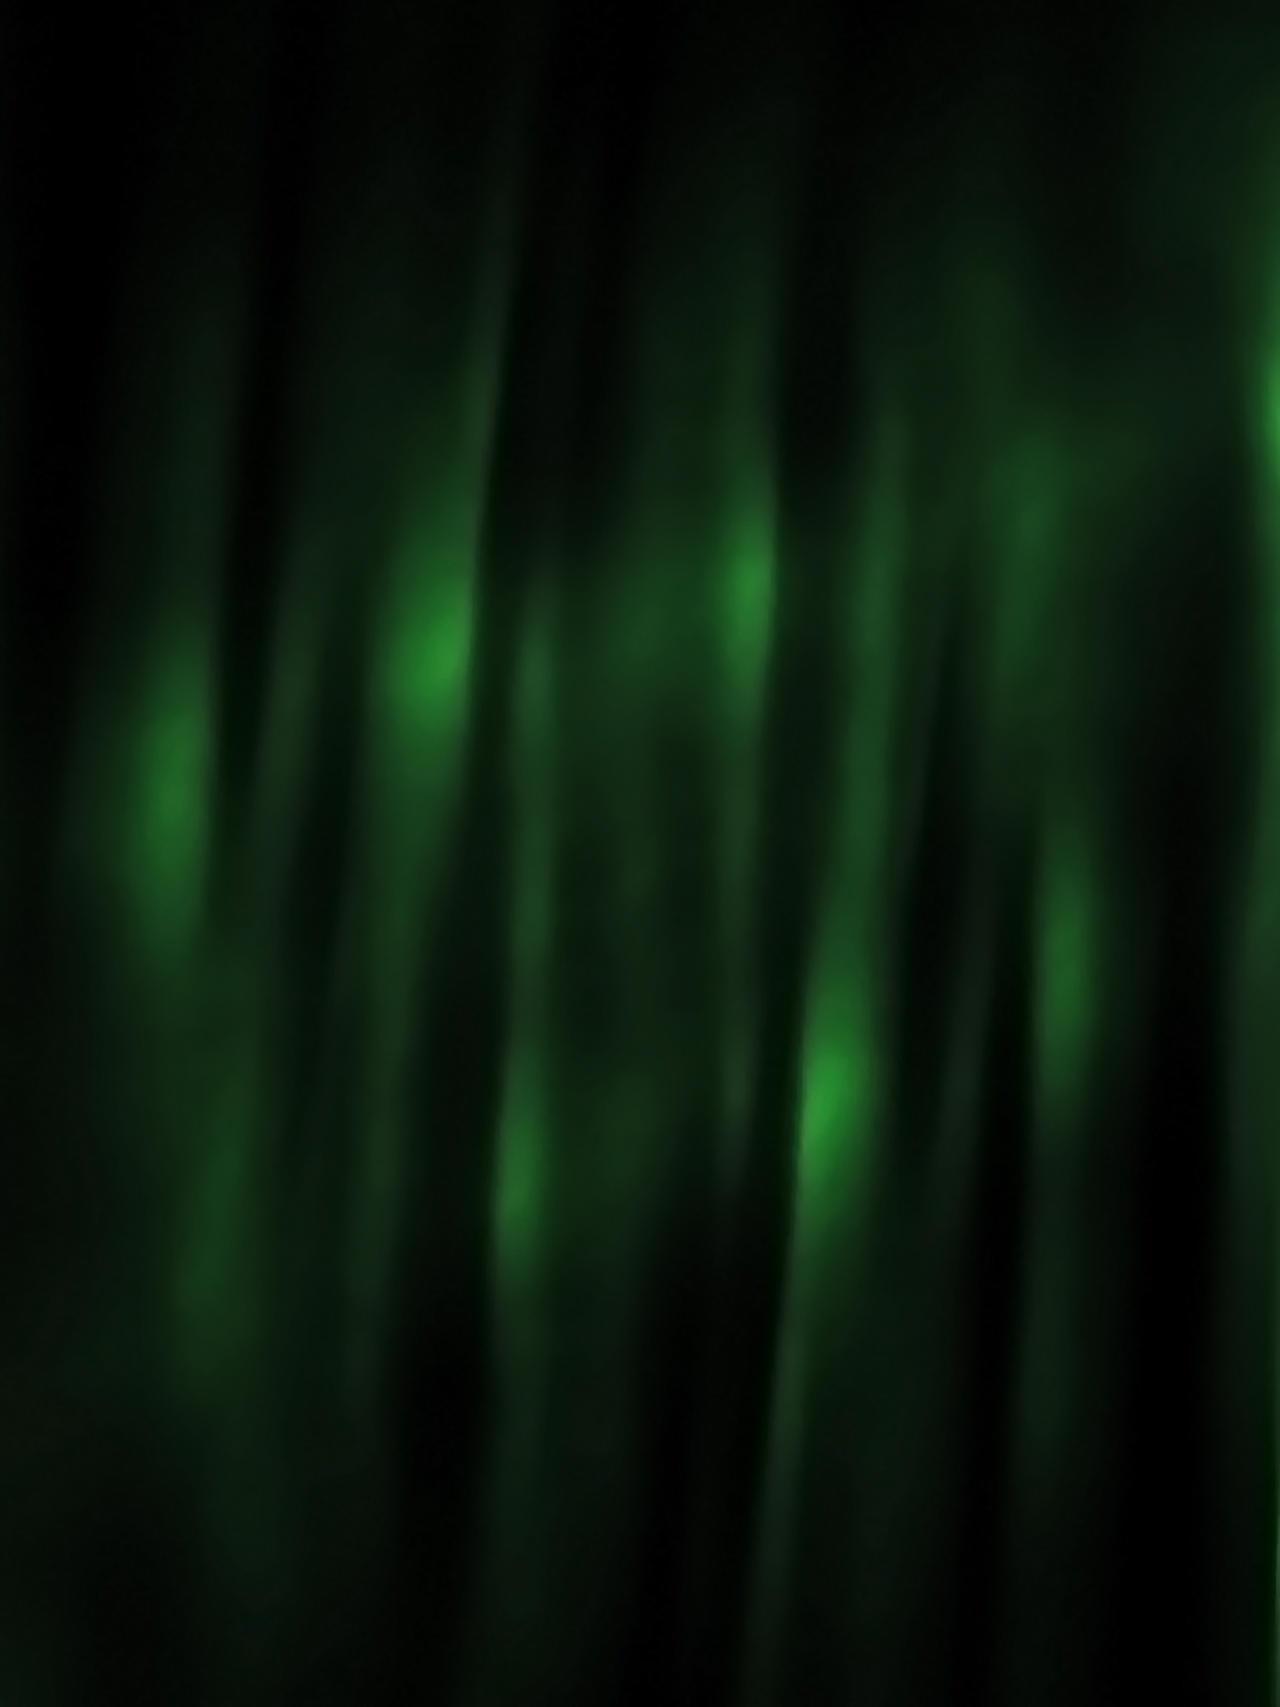 Curtains texture - Green Curtains Emerald Green And White Curtains Emerald Green